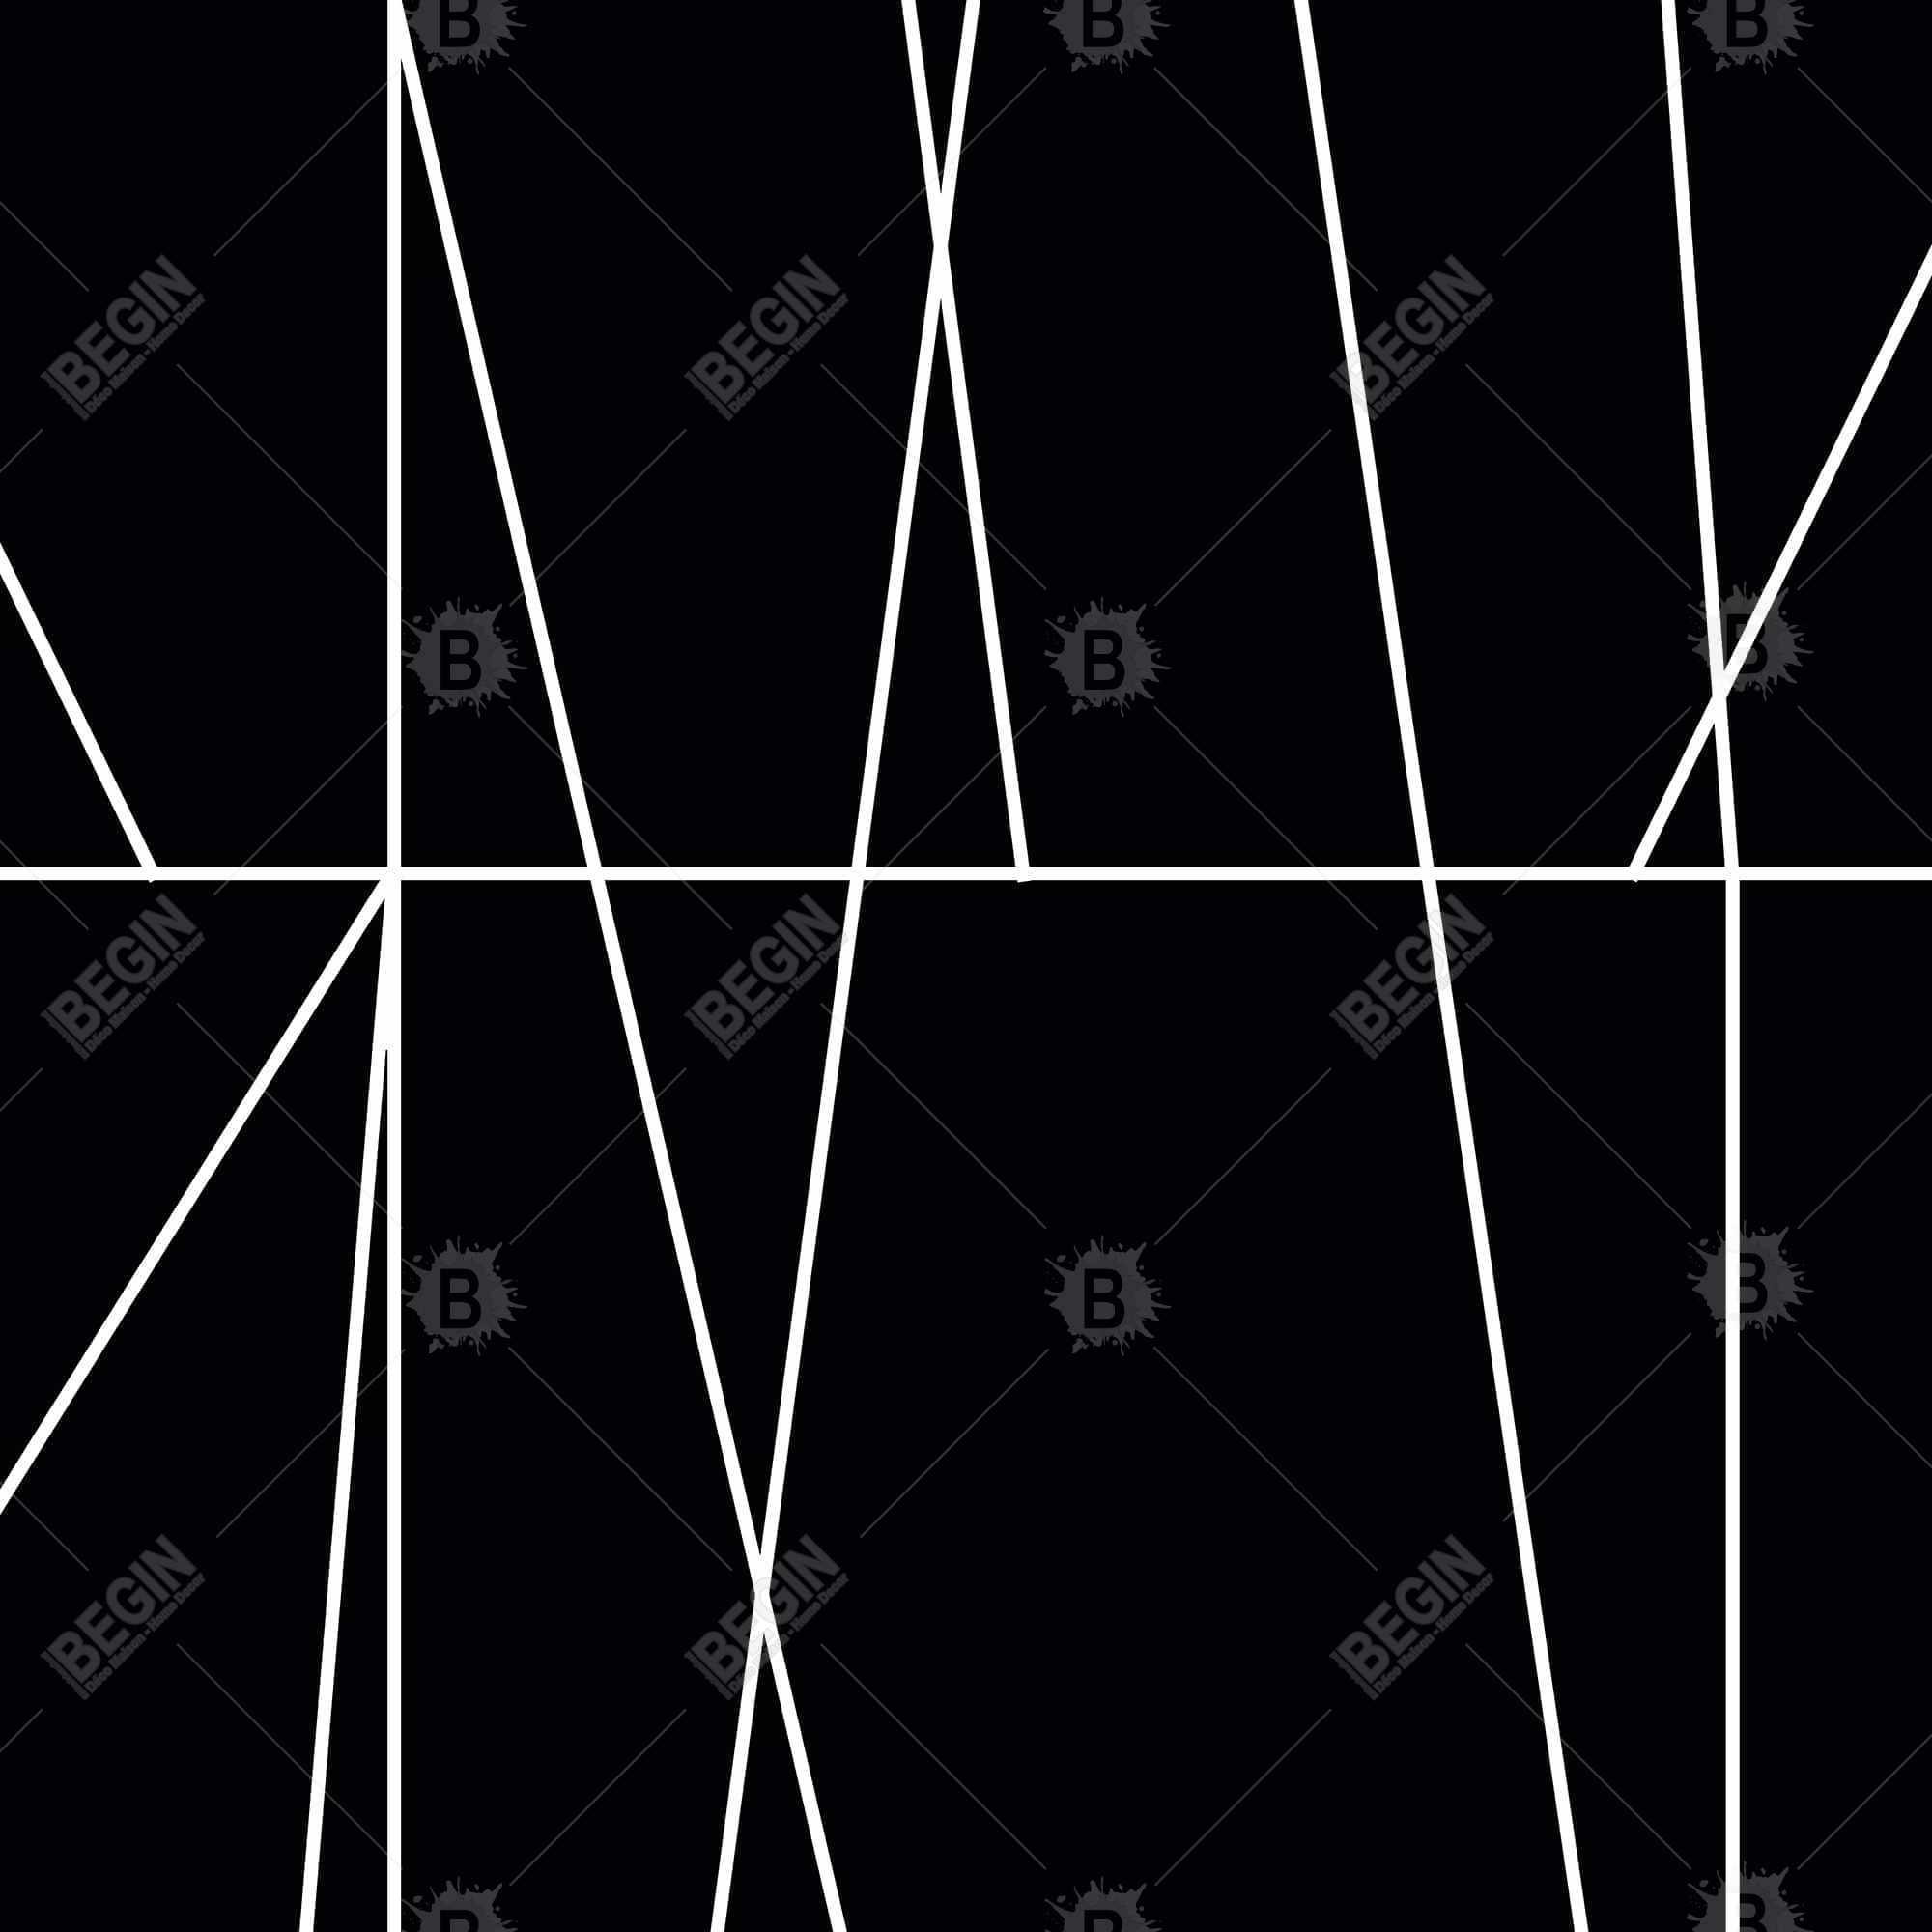 White stripes on black background